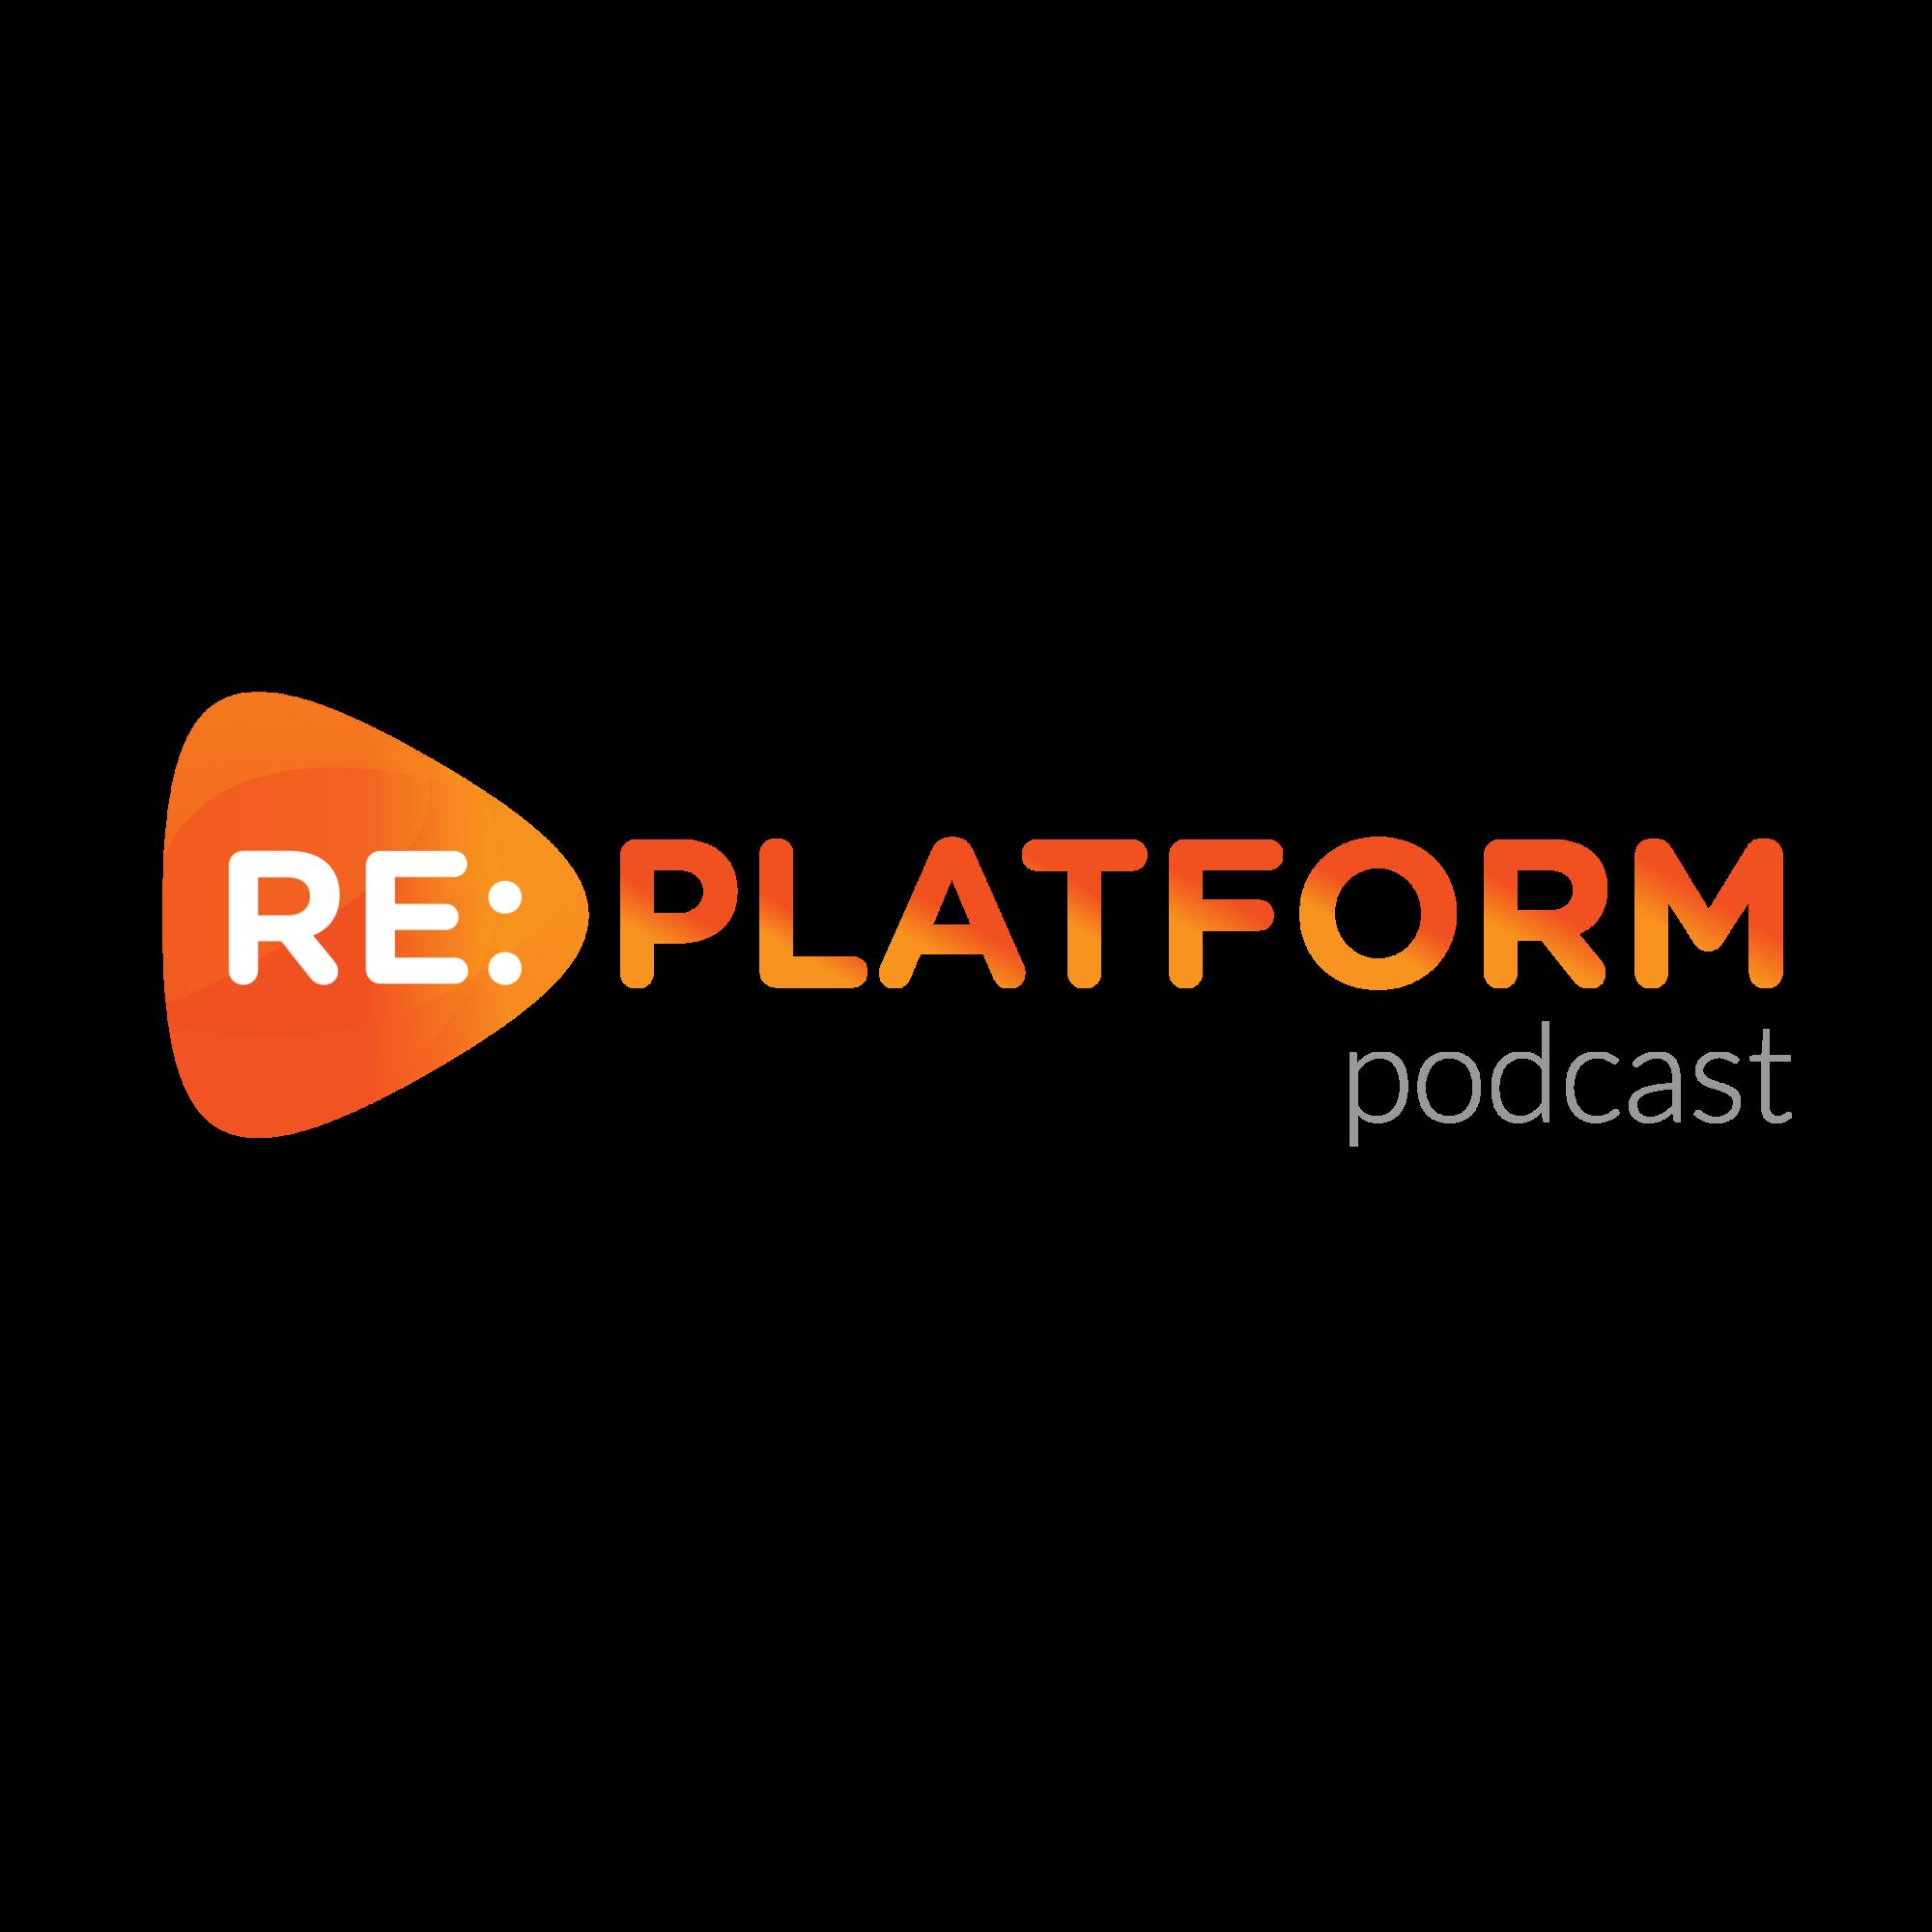 Re:Platform